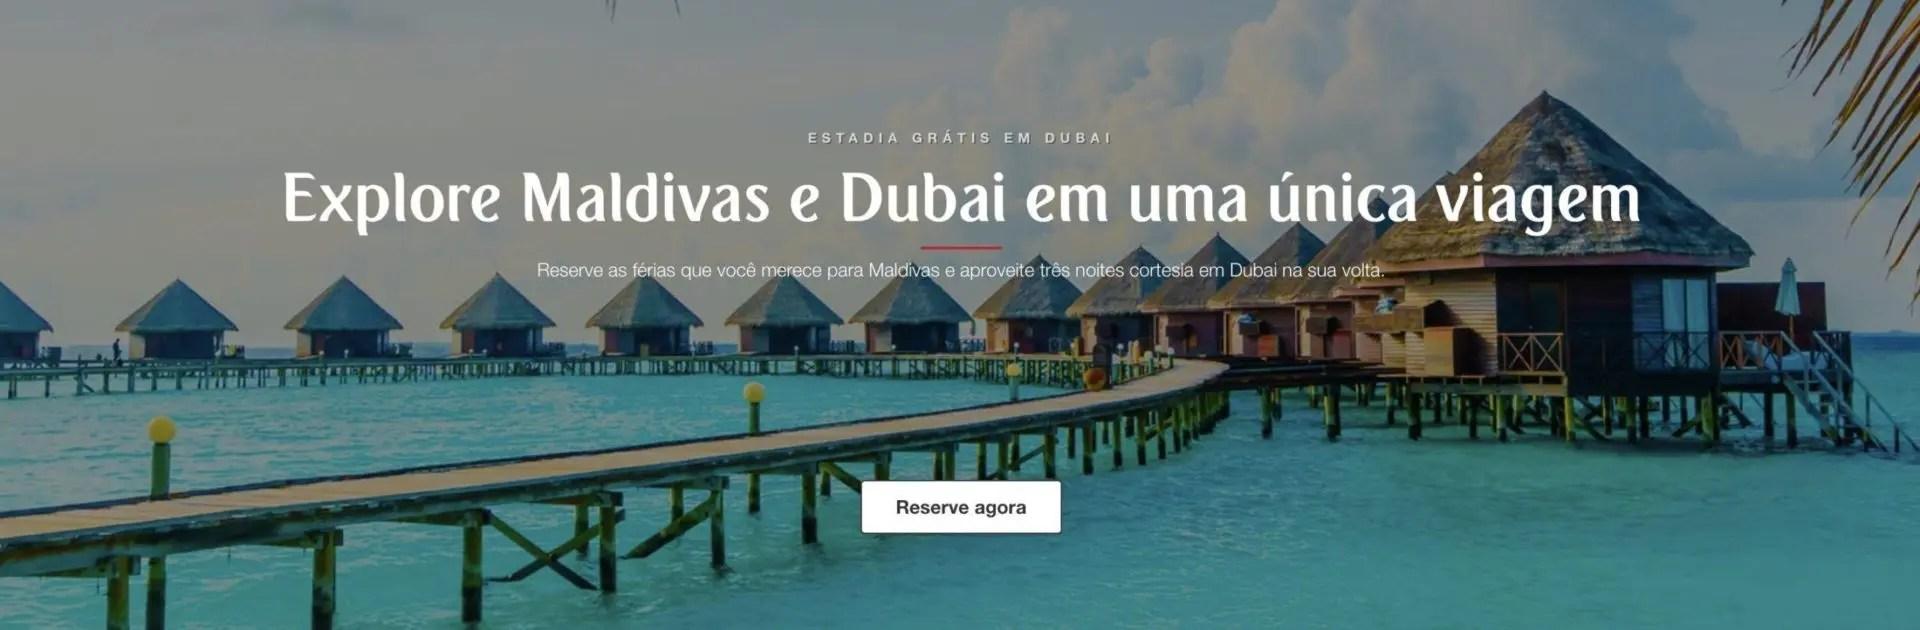 Emirates estadia Dubai Maldivas